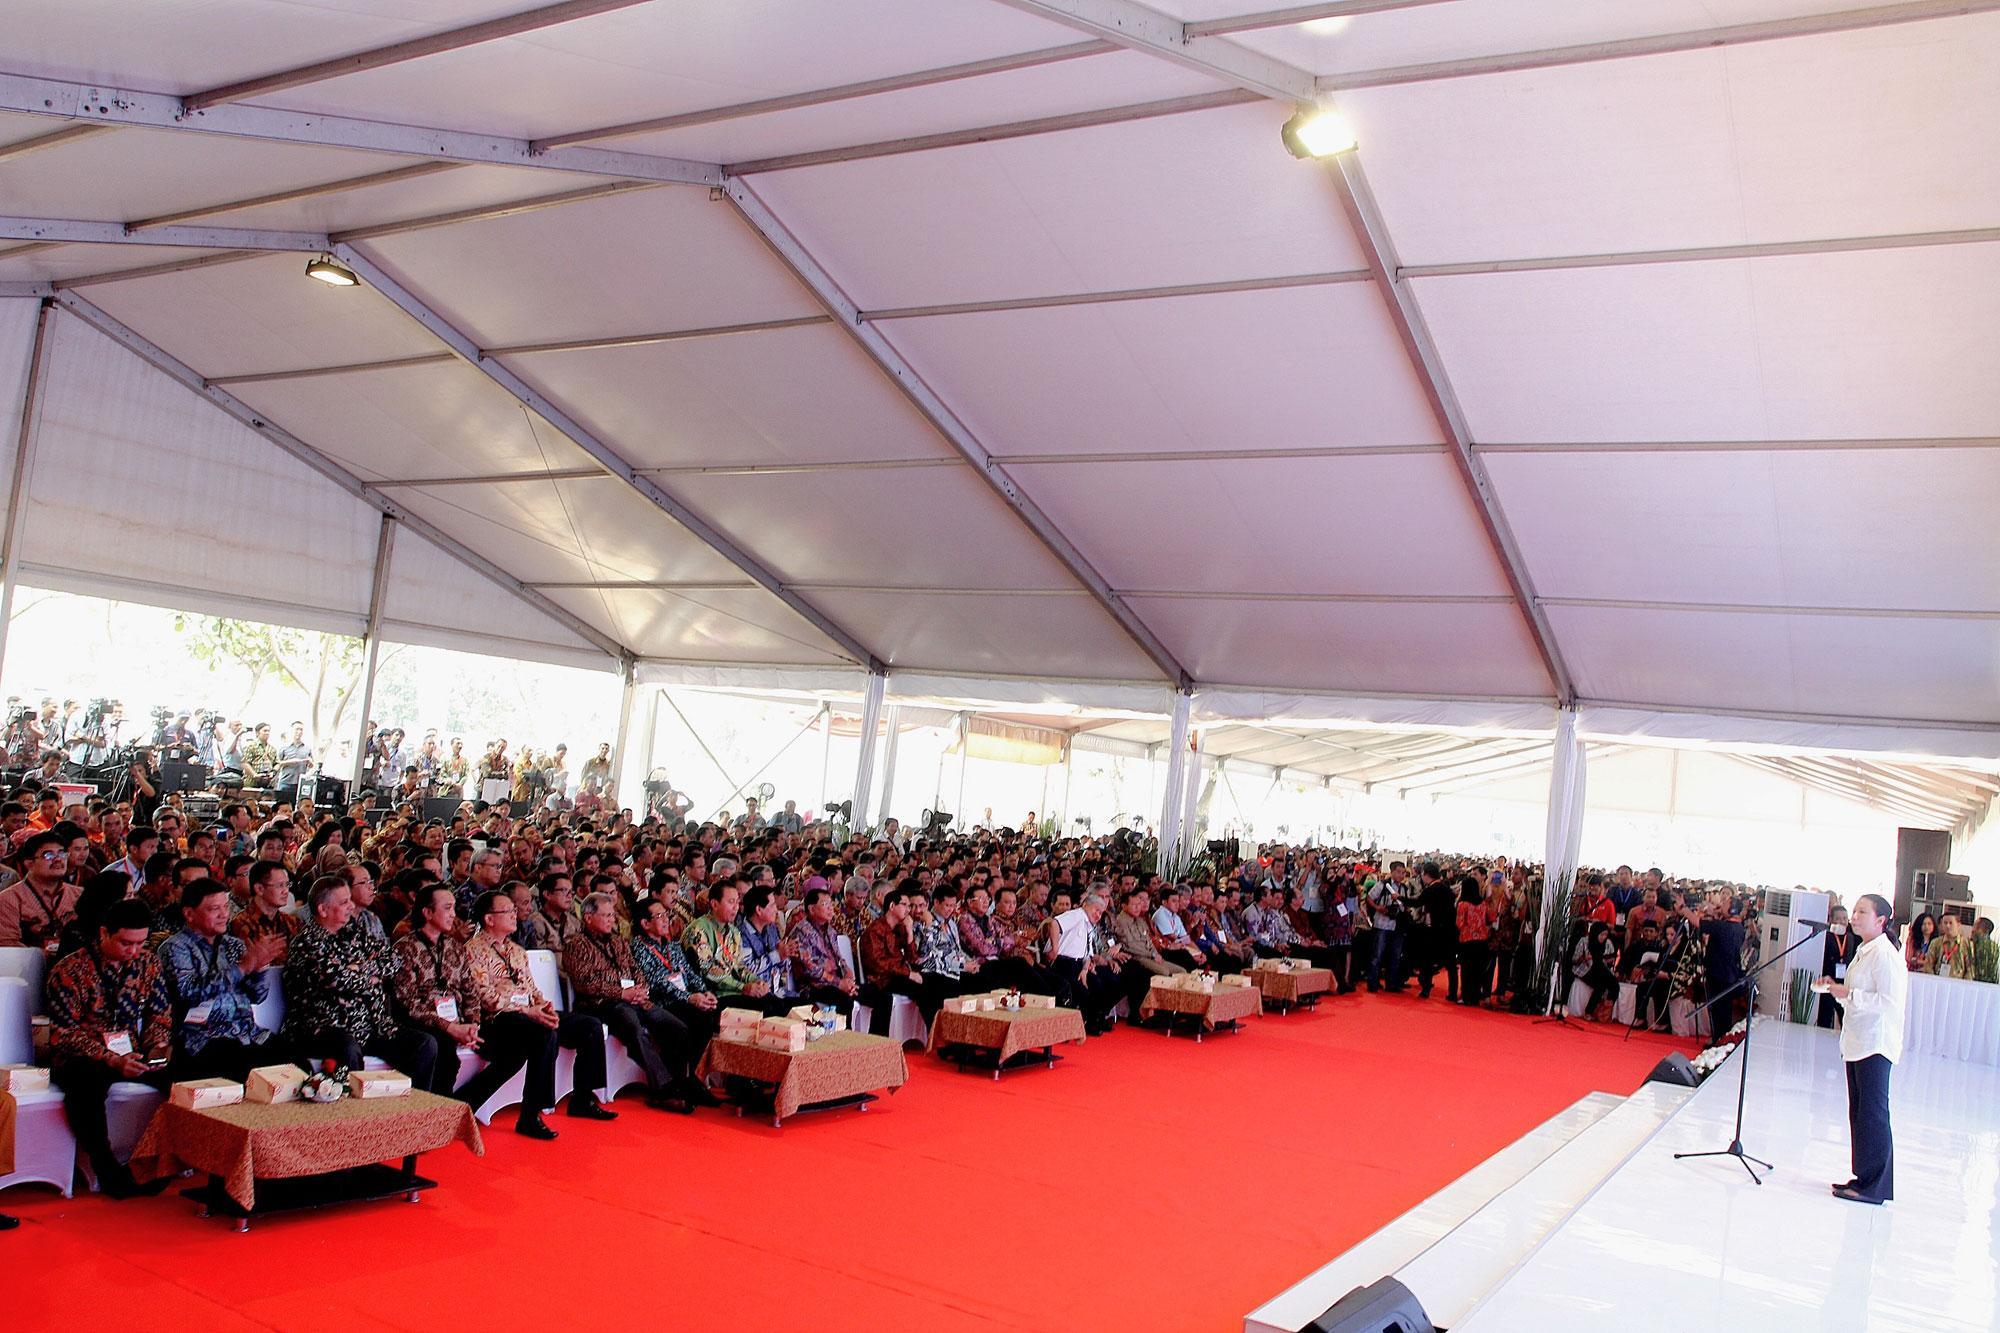 Menteri BUMN, Rini Soemarno memberikan sambutan di hadapan hampir 6000 karyawan tingkat dasar seluruh Kementerian BUMN Republik Indonesia beserta seluruh Badan Usaha Milik Negara (BUMN) di Indonesia, saat menggelar rangkaian acara \